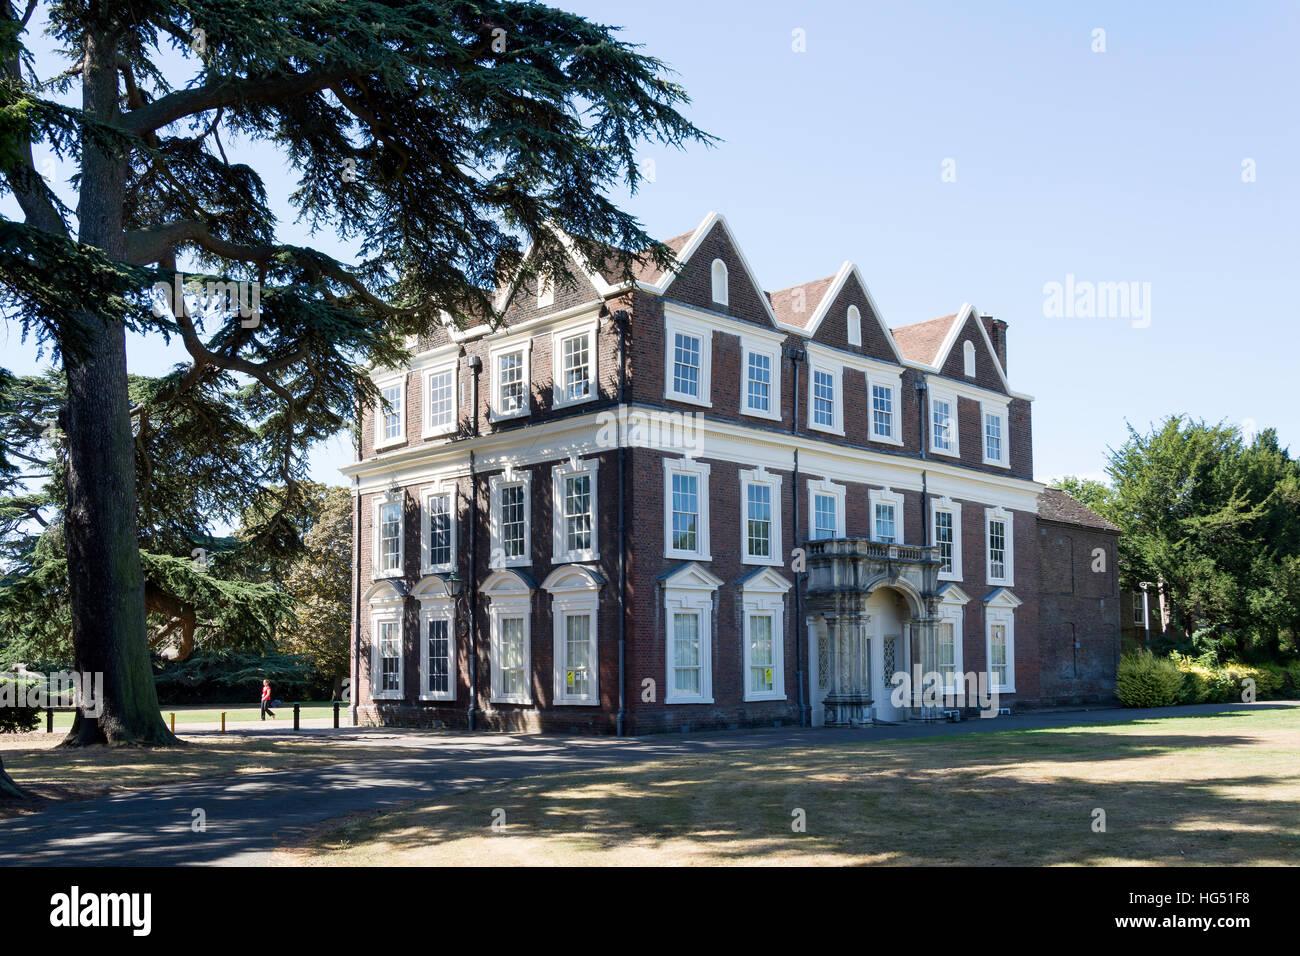 Boston Manor House Park Brentford London Borough Of Hounslow Greater